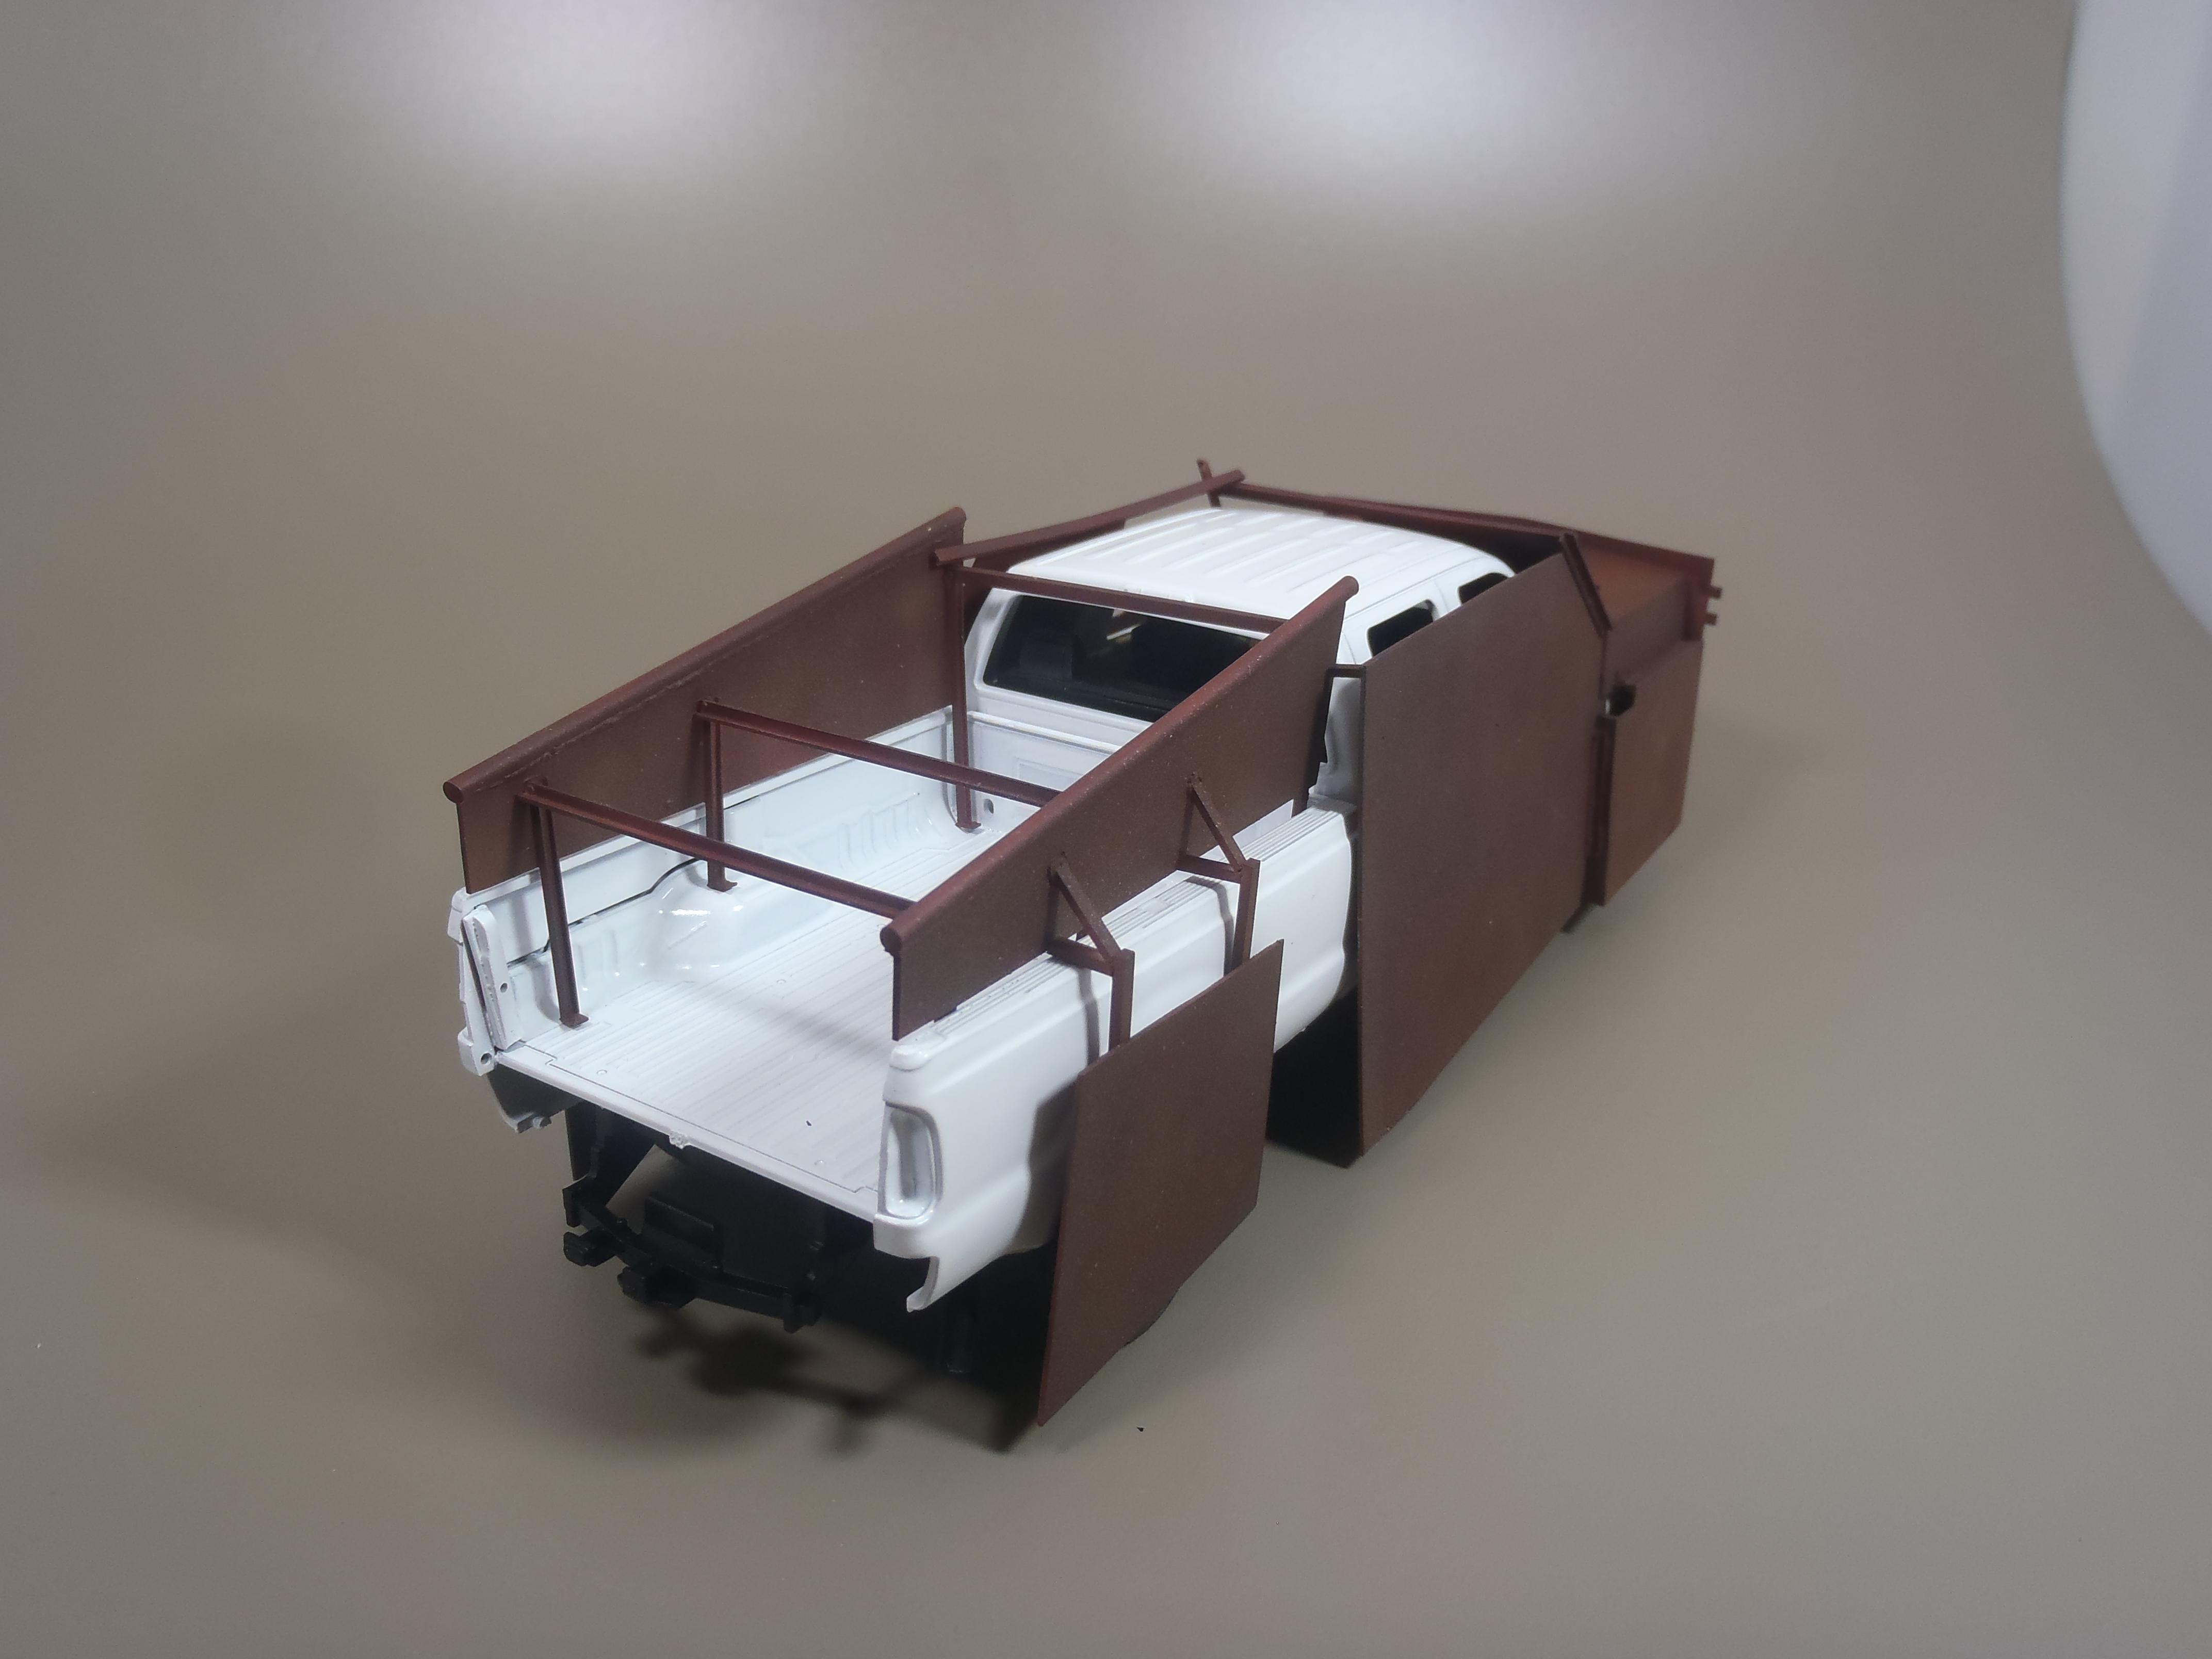 Pickup F 350 (Meng) au 1/35 - Page 2 16111509540815742614639665